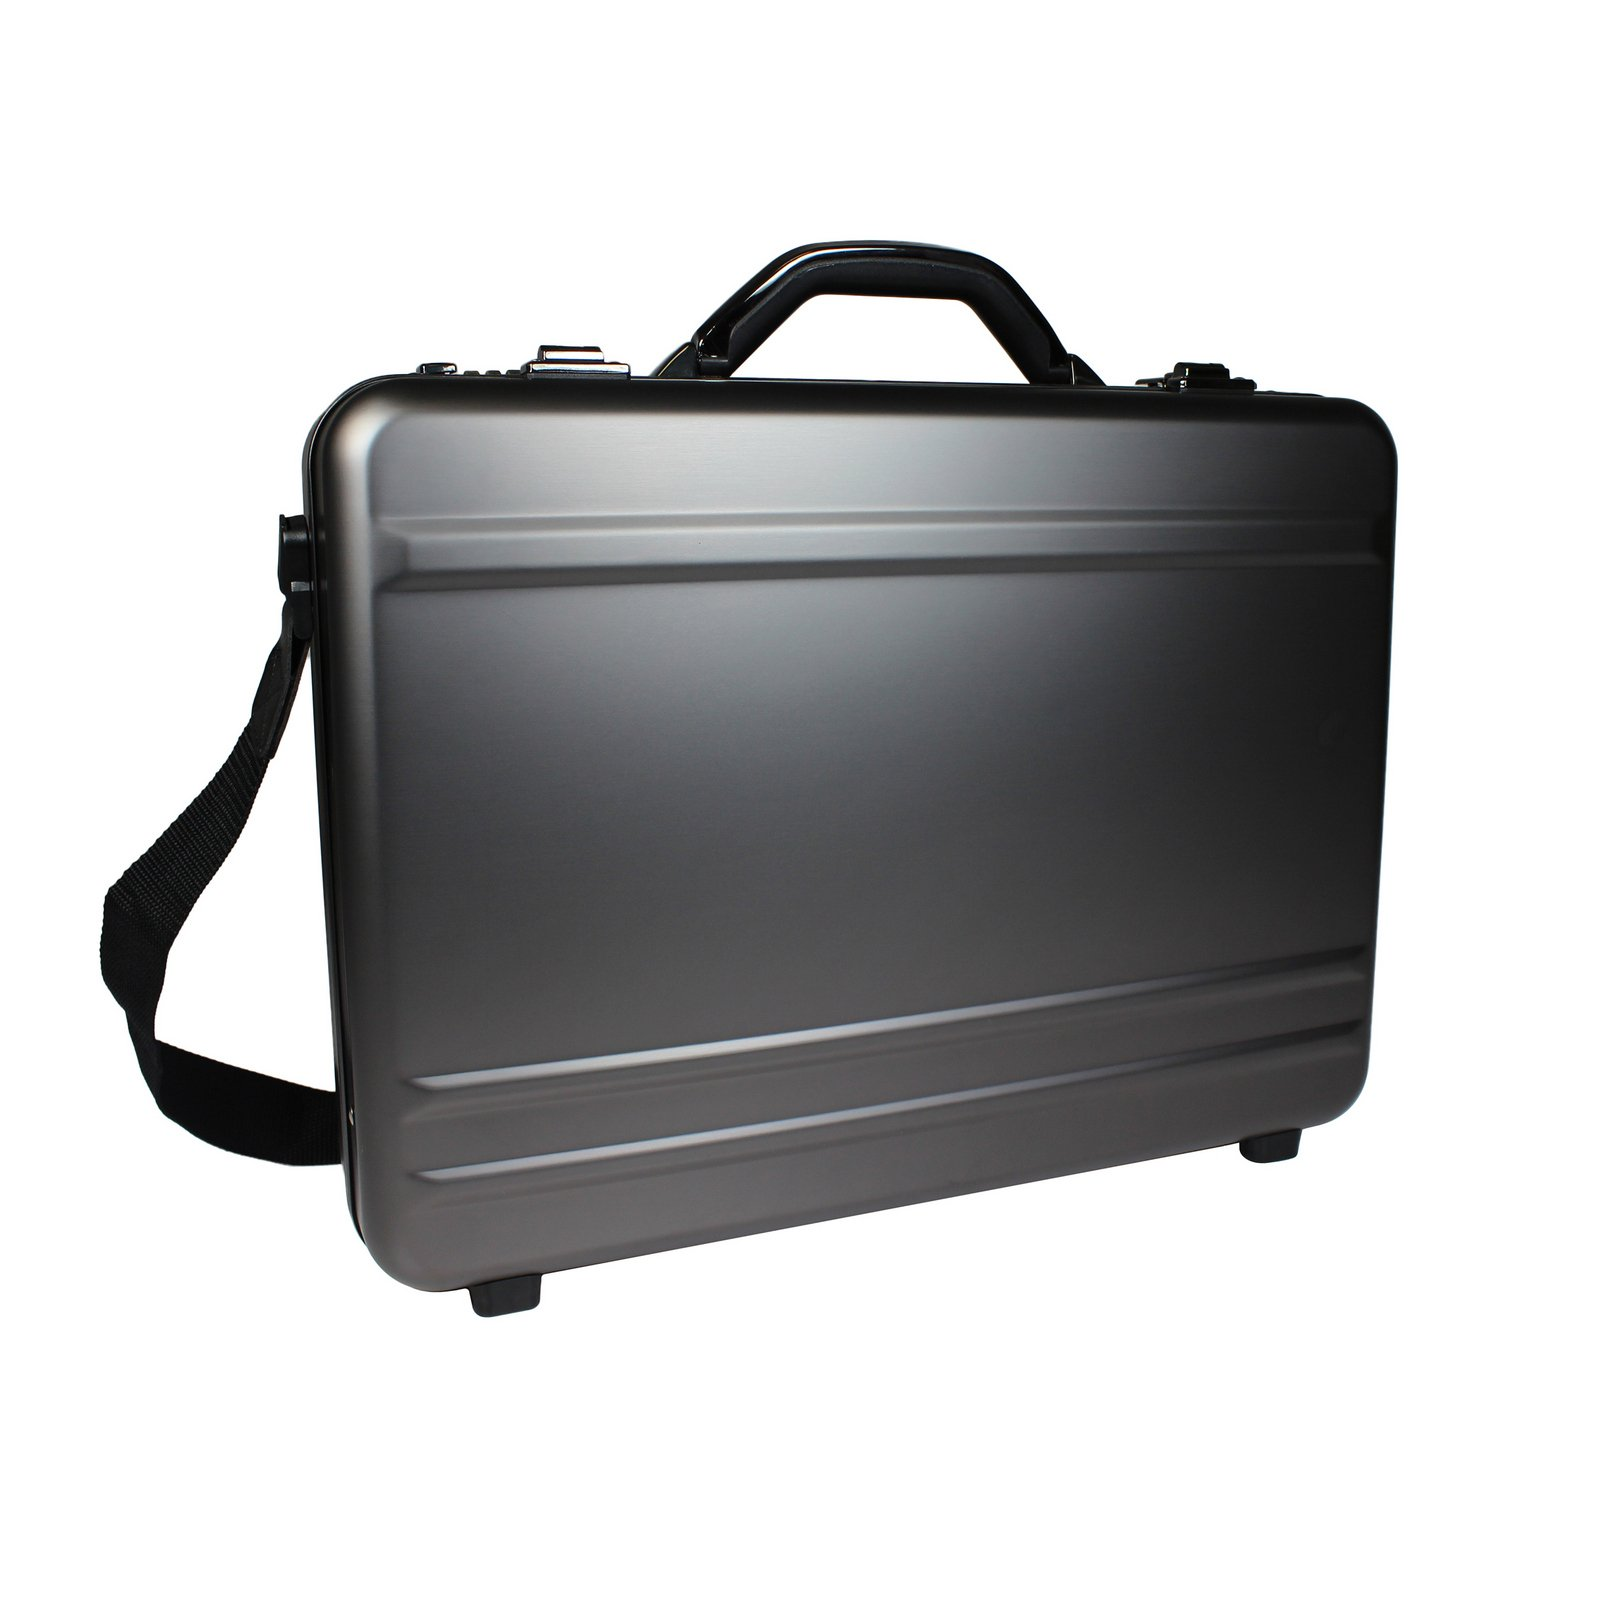 World Traveler European-Style Gun Metal Aluminum Attache Case Laptop Briefcase, Silver, One Size